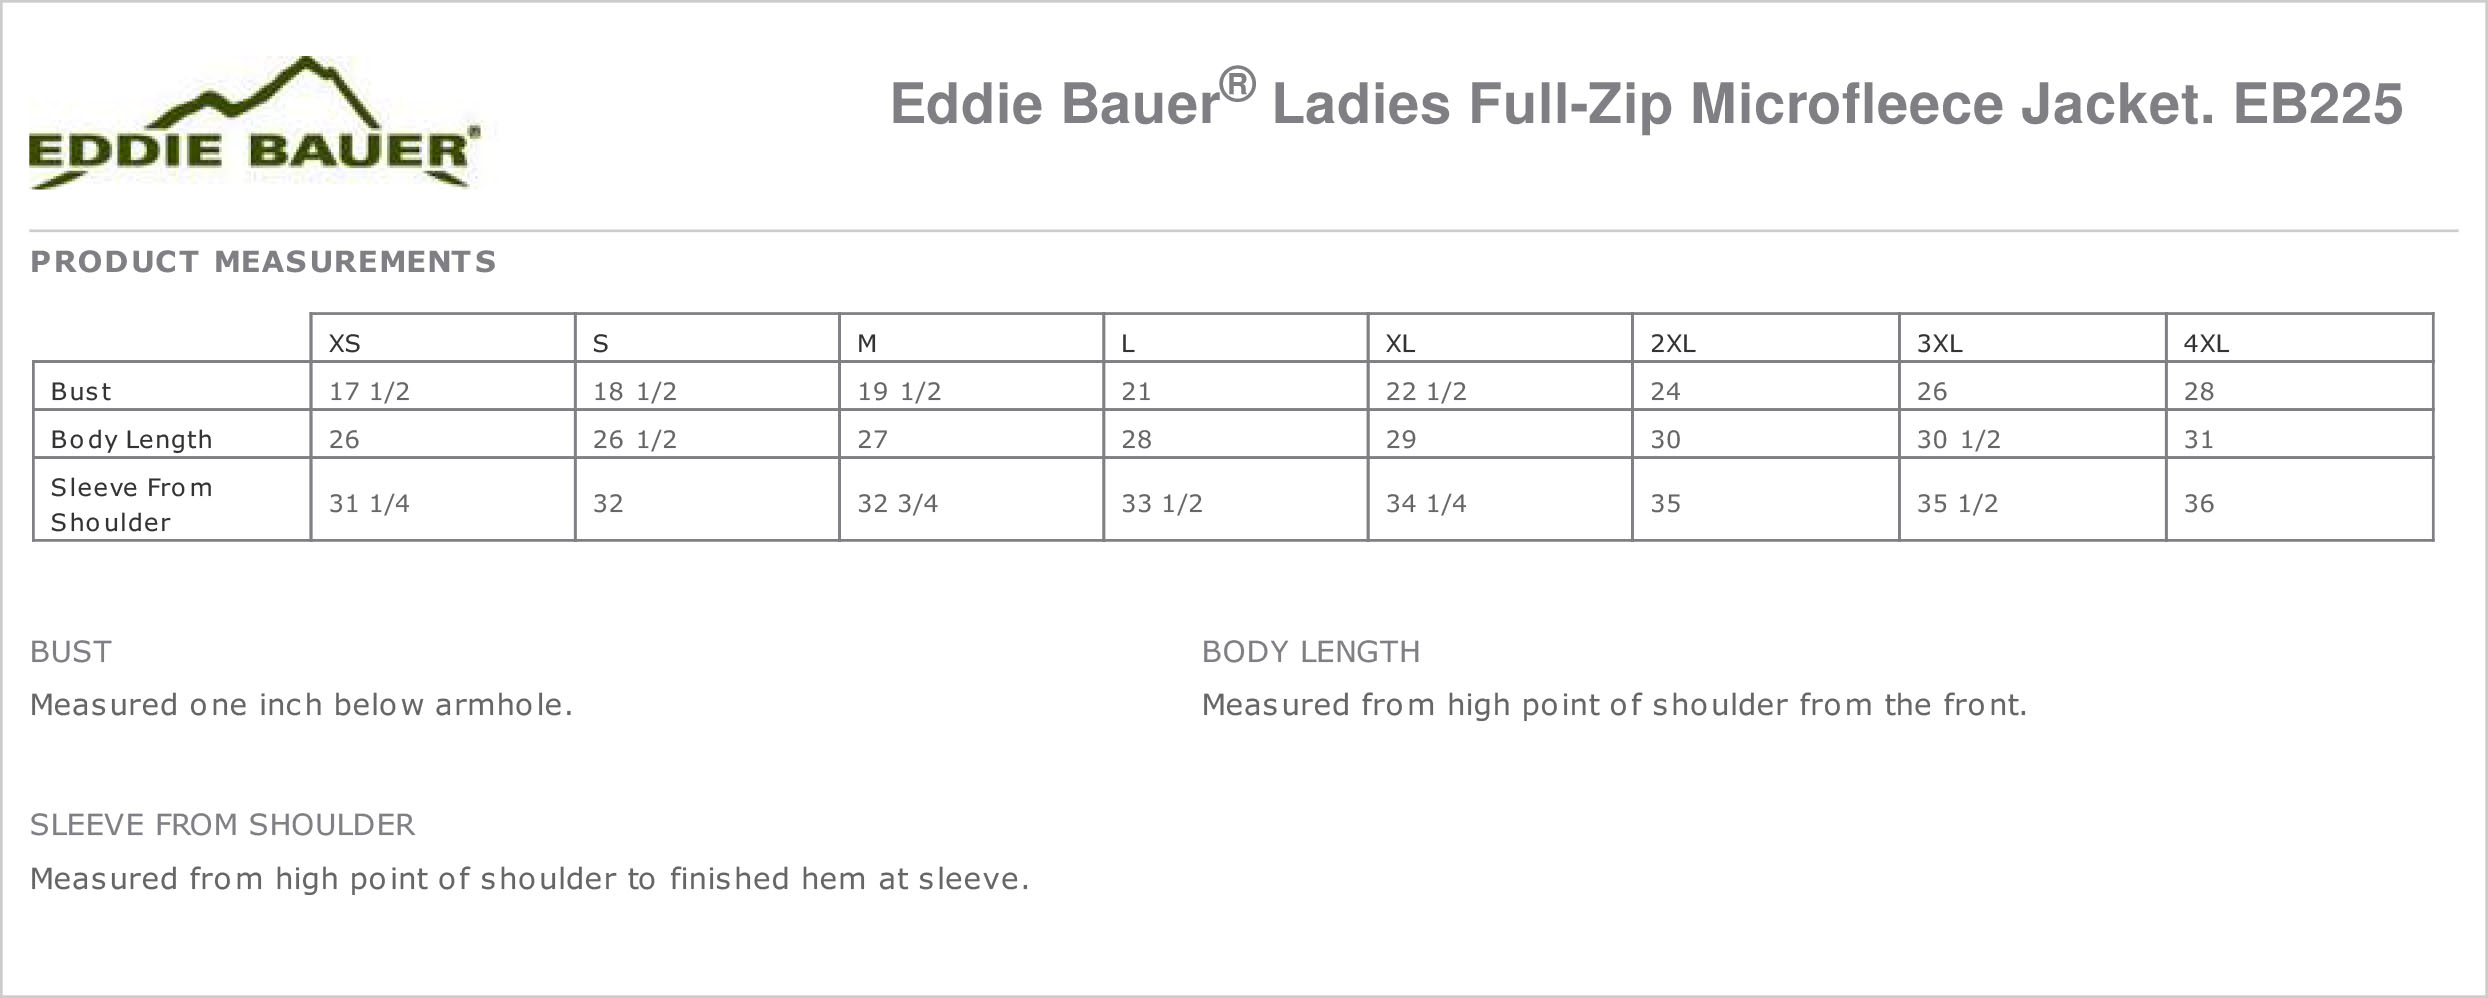 EB225_productmeasurement.jpg